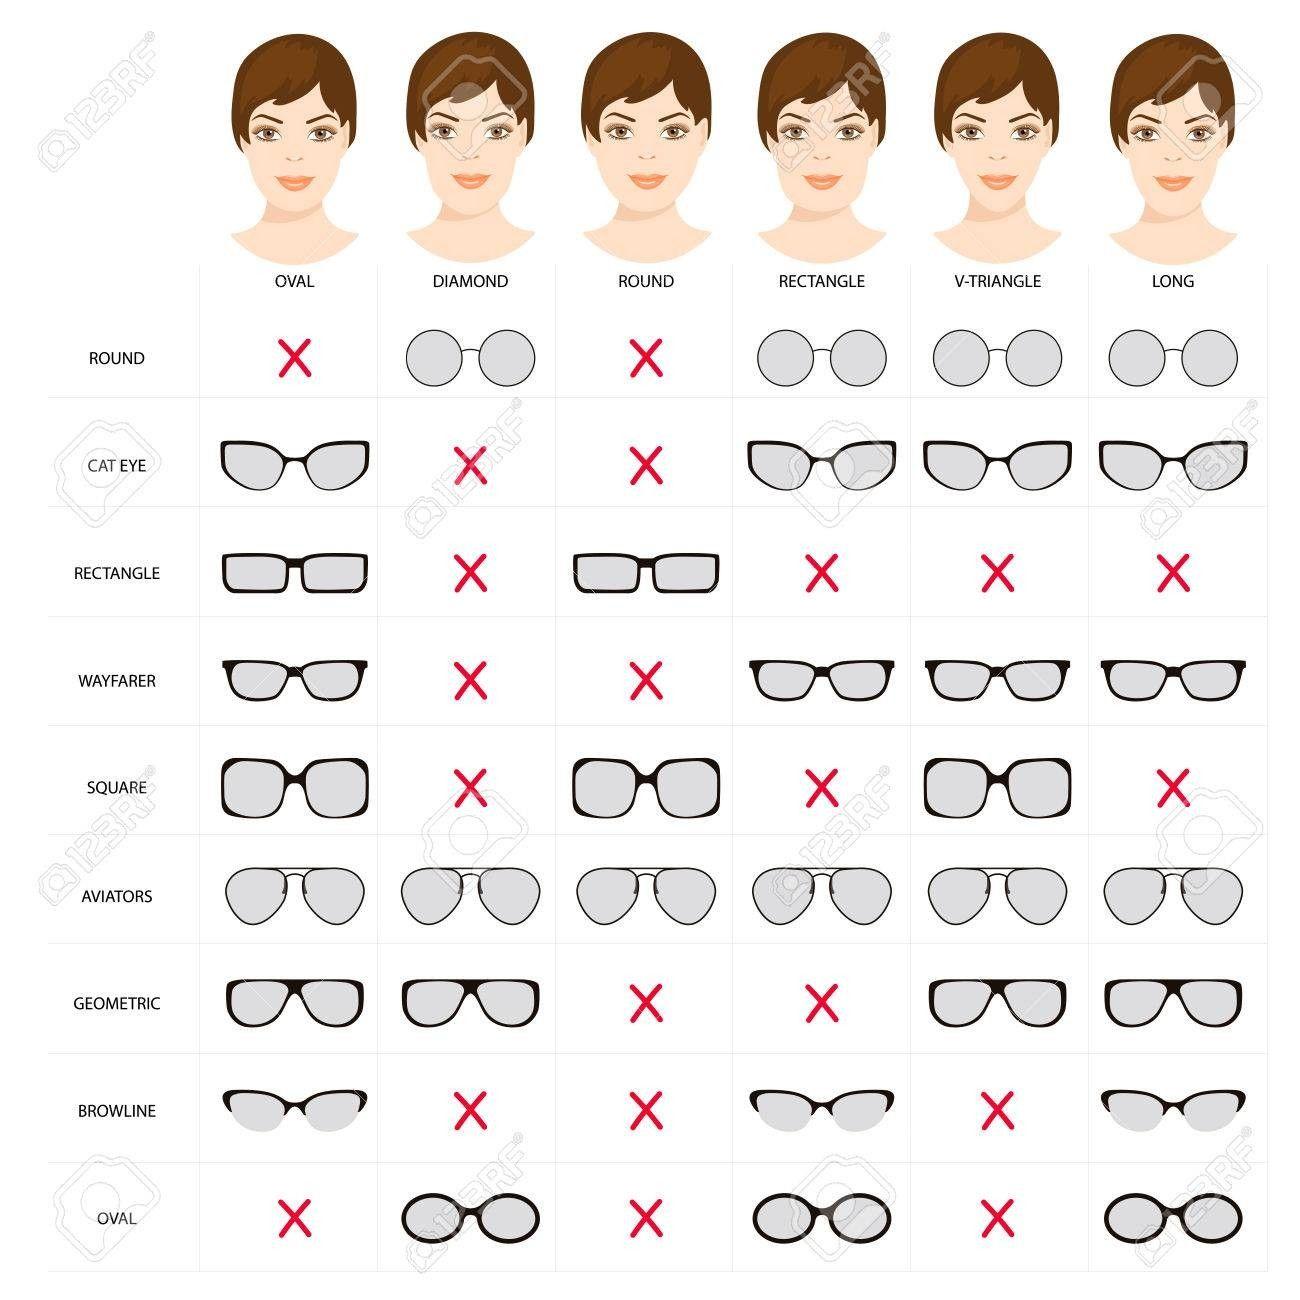 Pin De Femke Kalisvaart Em Fashion Oculos Formato Do Rosto